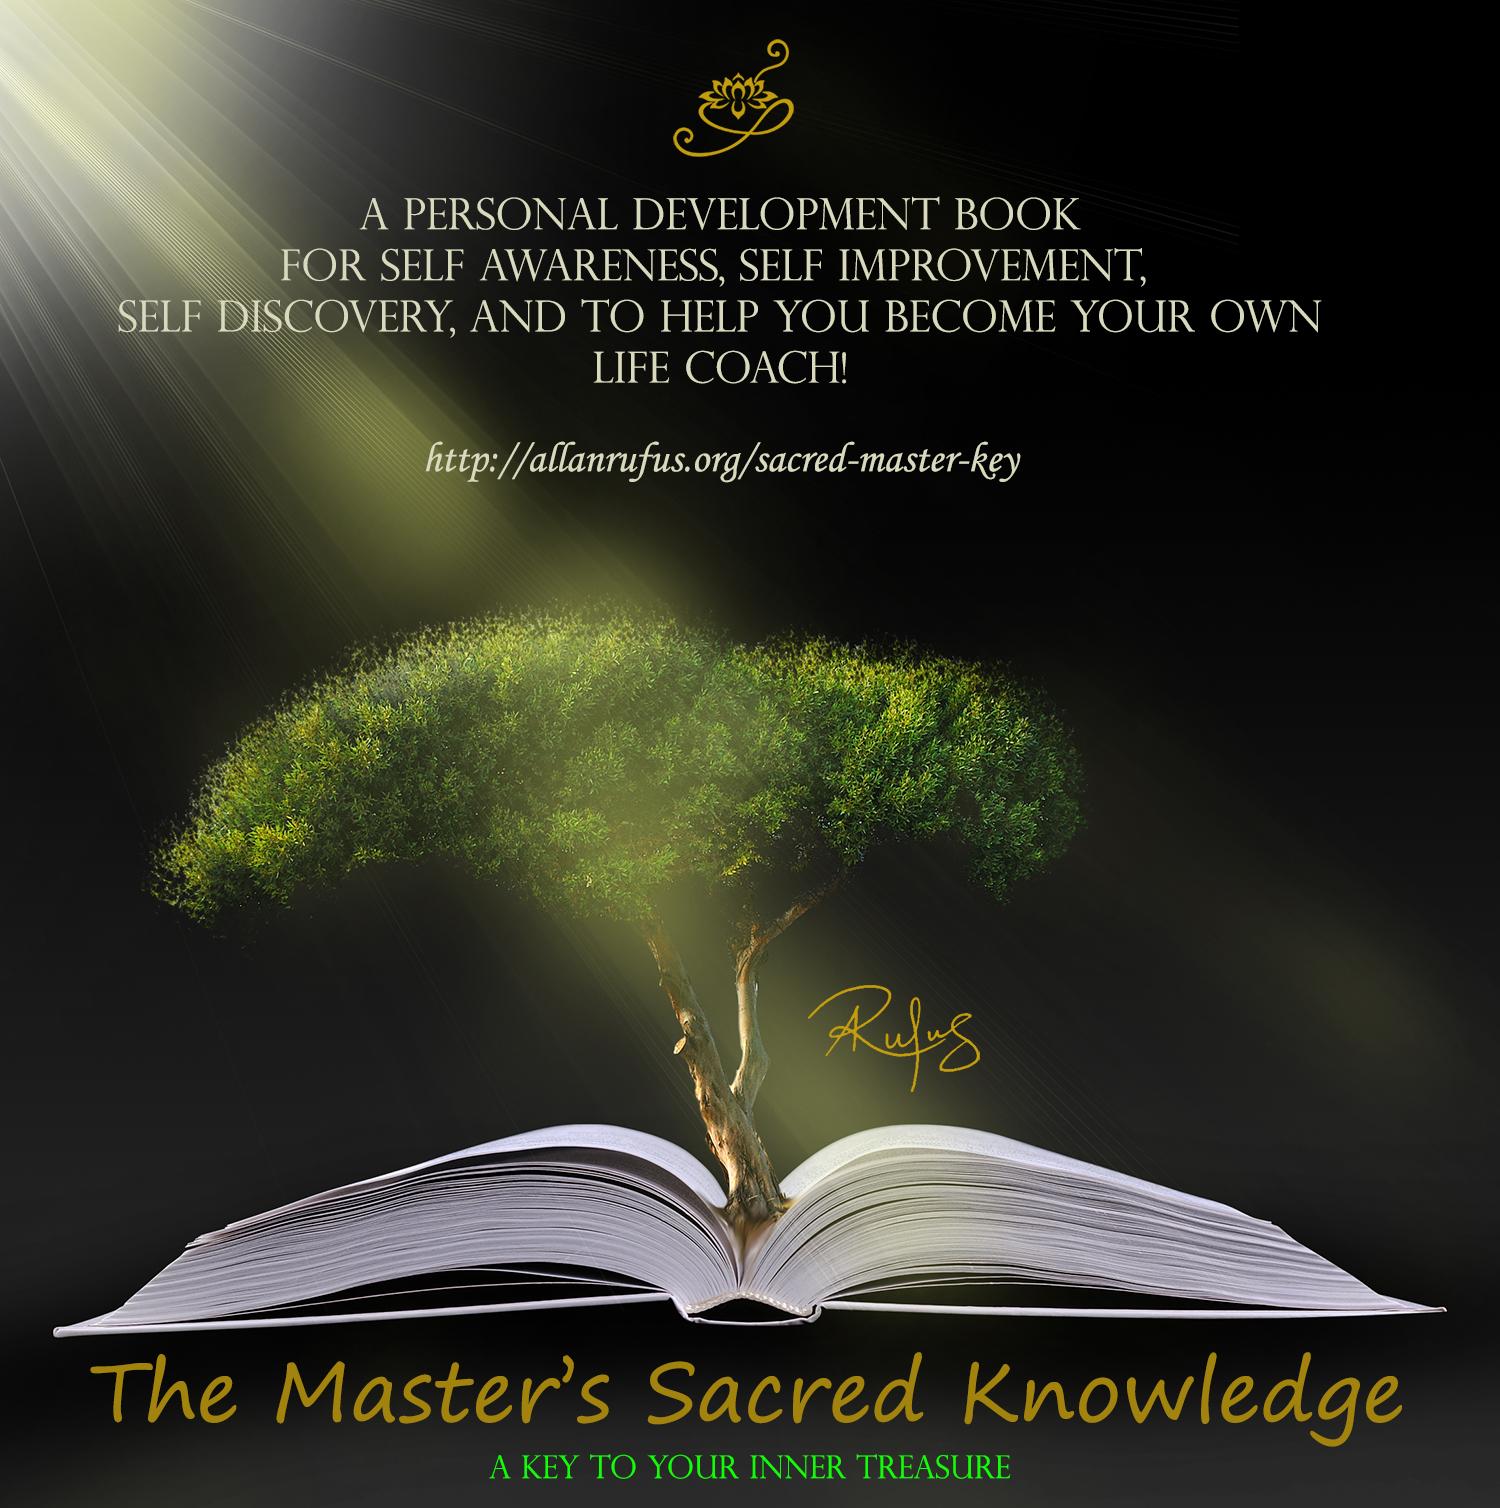 A Personal Development Book For Self Awareness Self